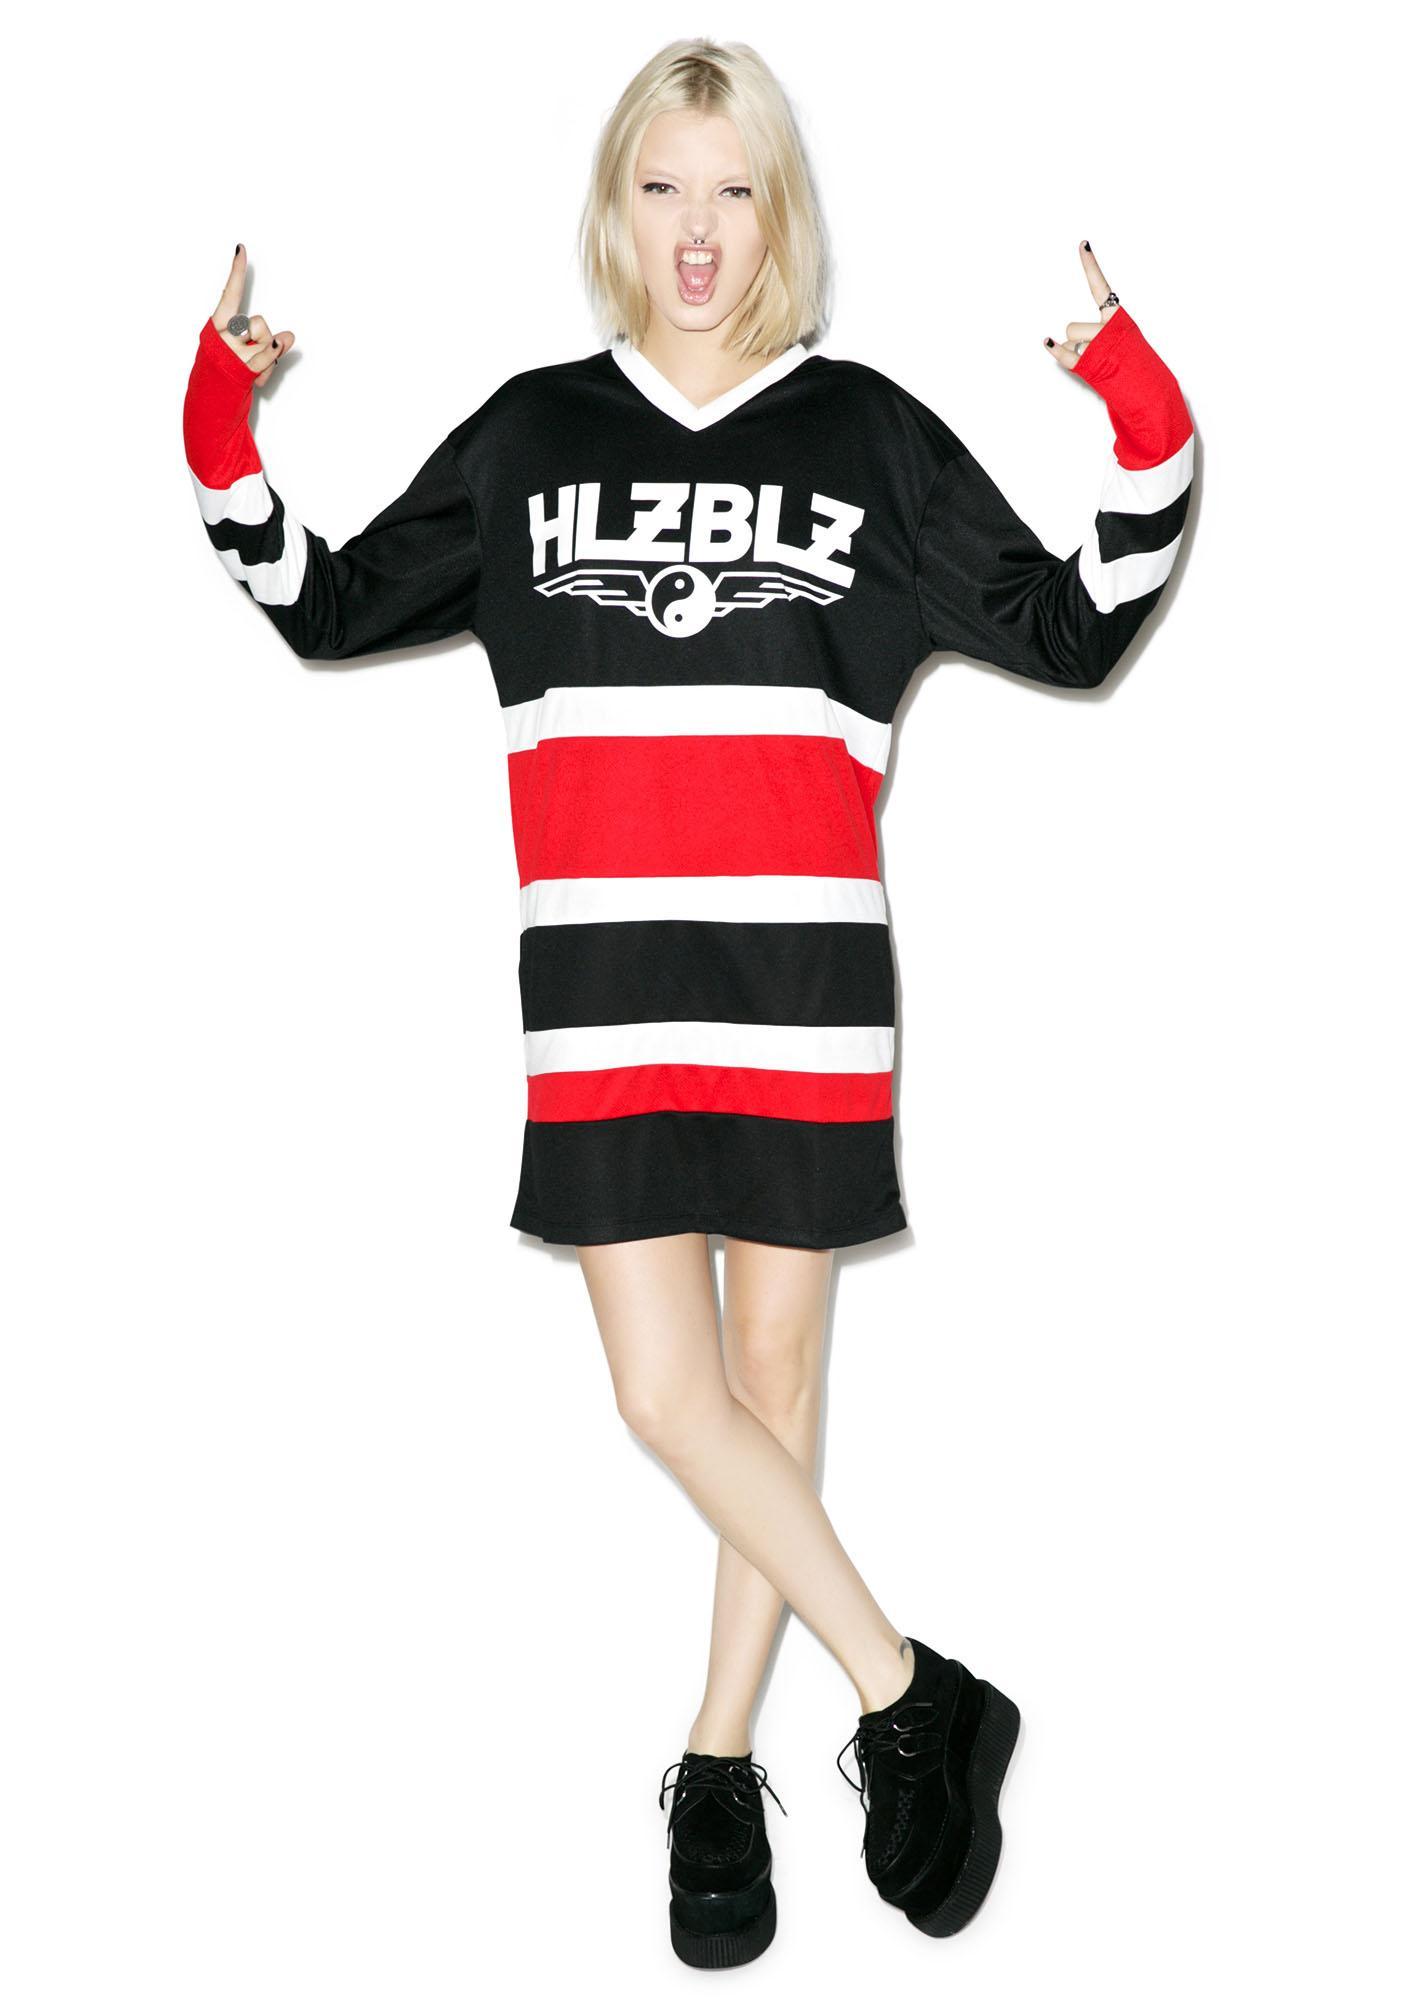 HLZBLZ Puck You Hockey Jersey